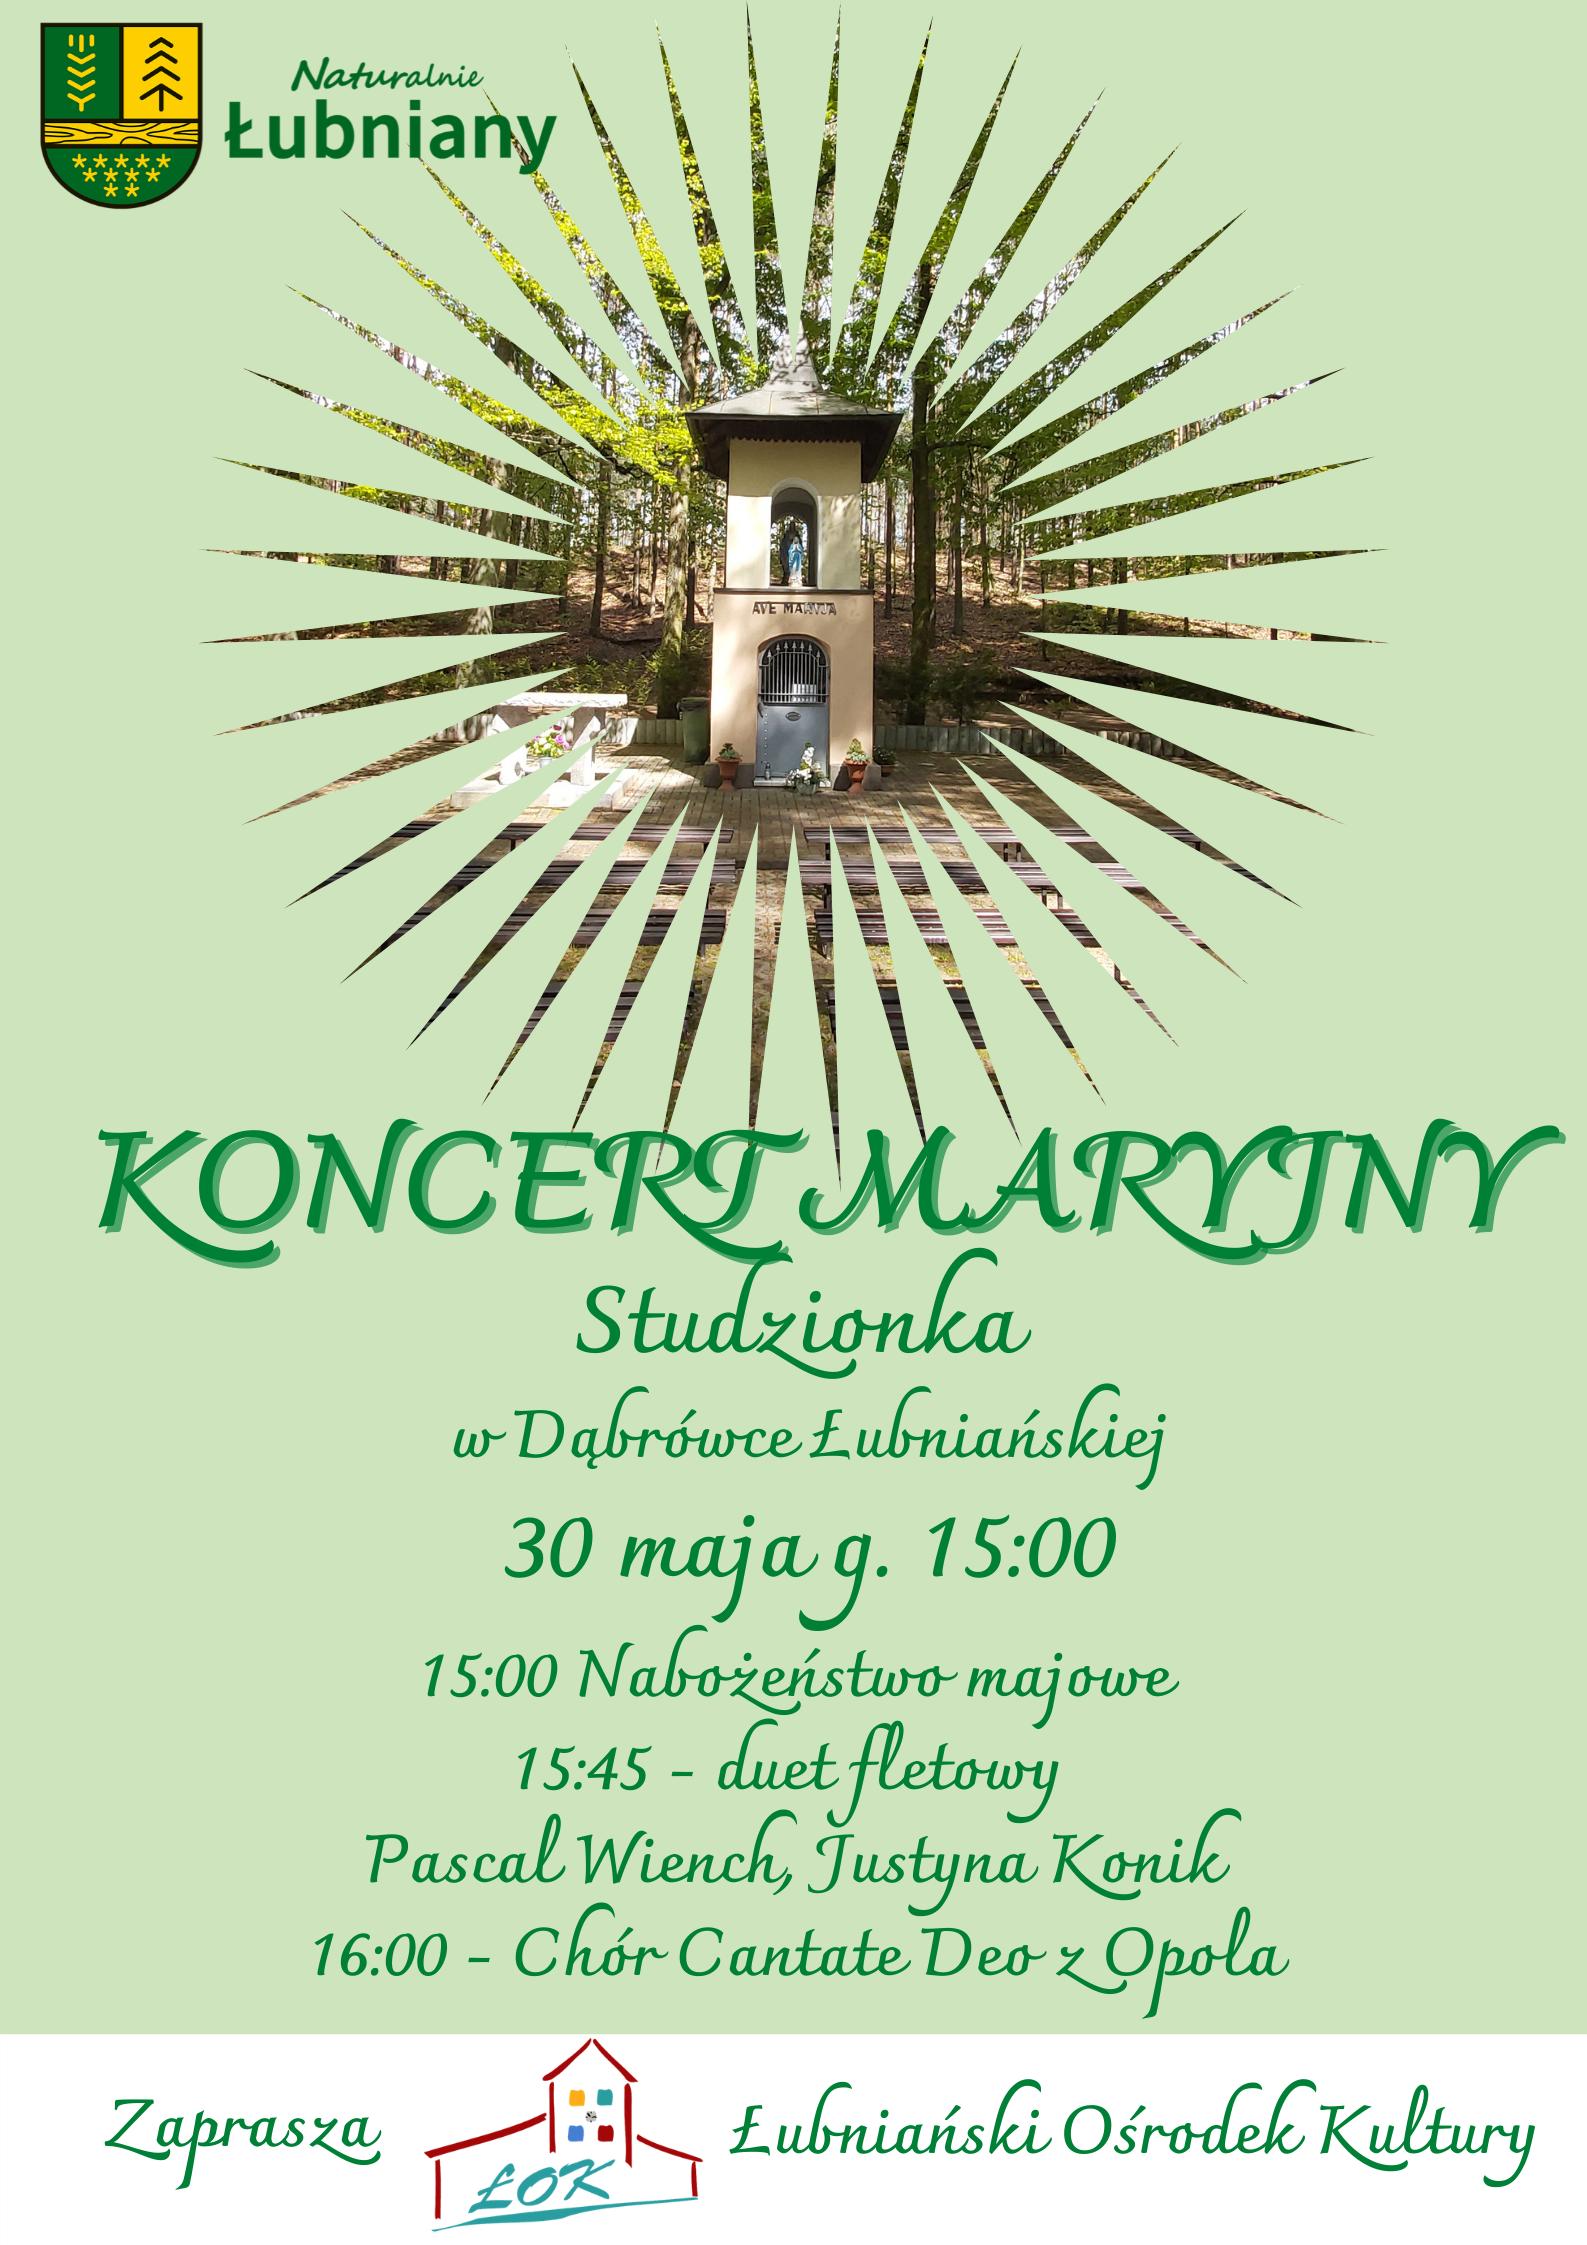 Plakat-zaproszenie na koncert maryjny na Studzionce